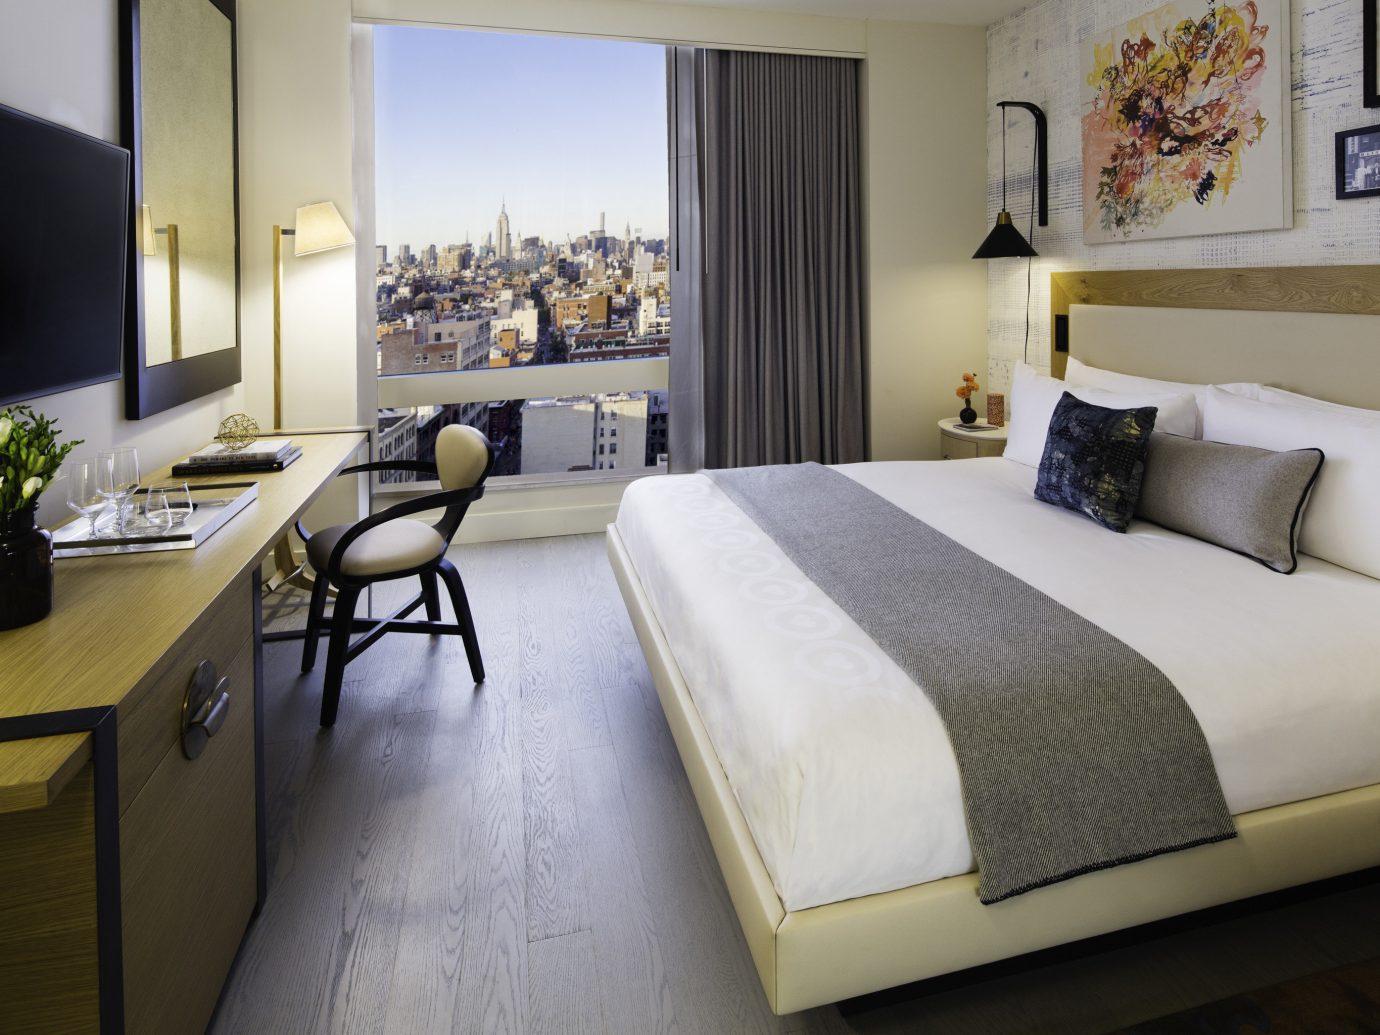 Hotels indoor floor wall bed sofa room hotel interior design Suite Bedroom bed frame furniture interior designer pillow decorated Modern